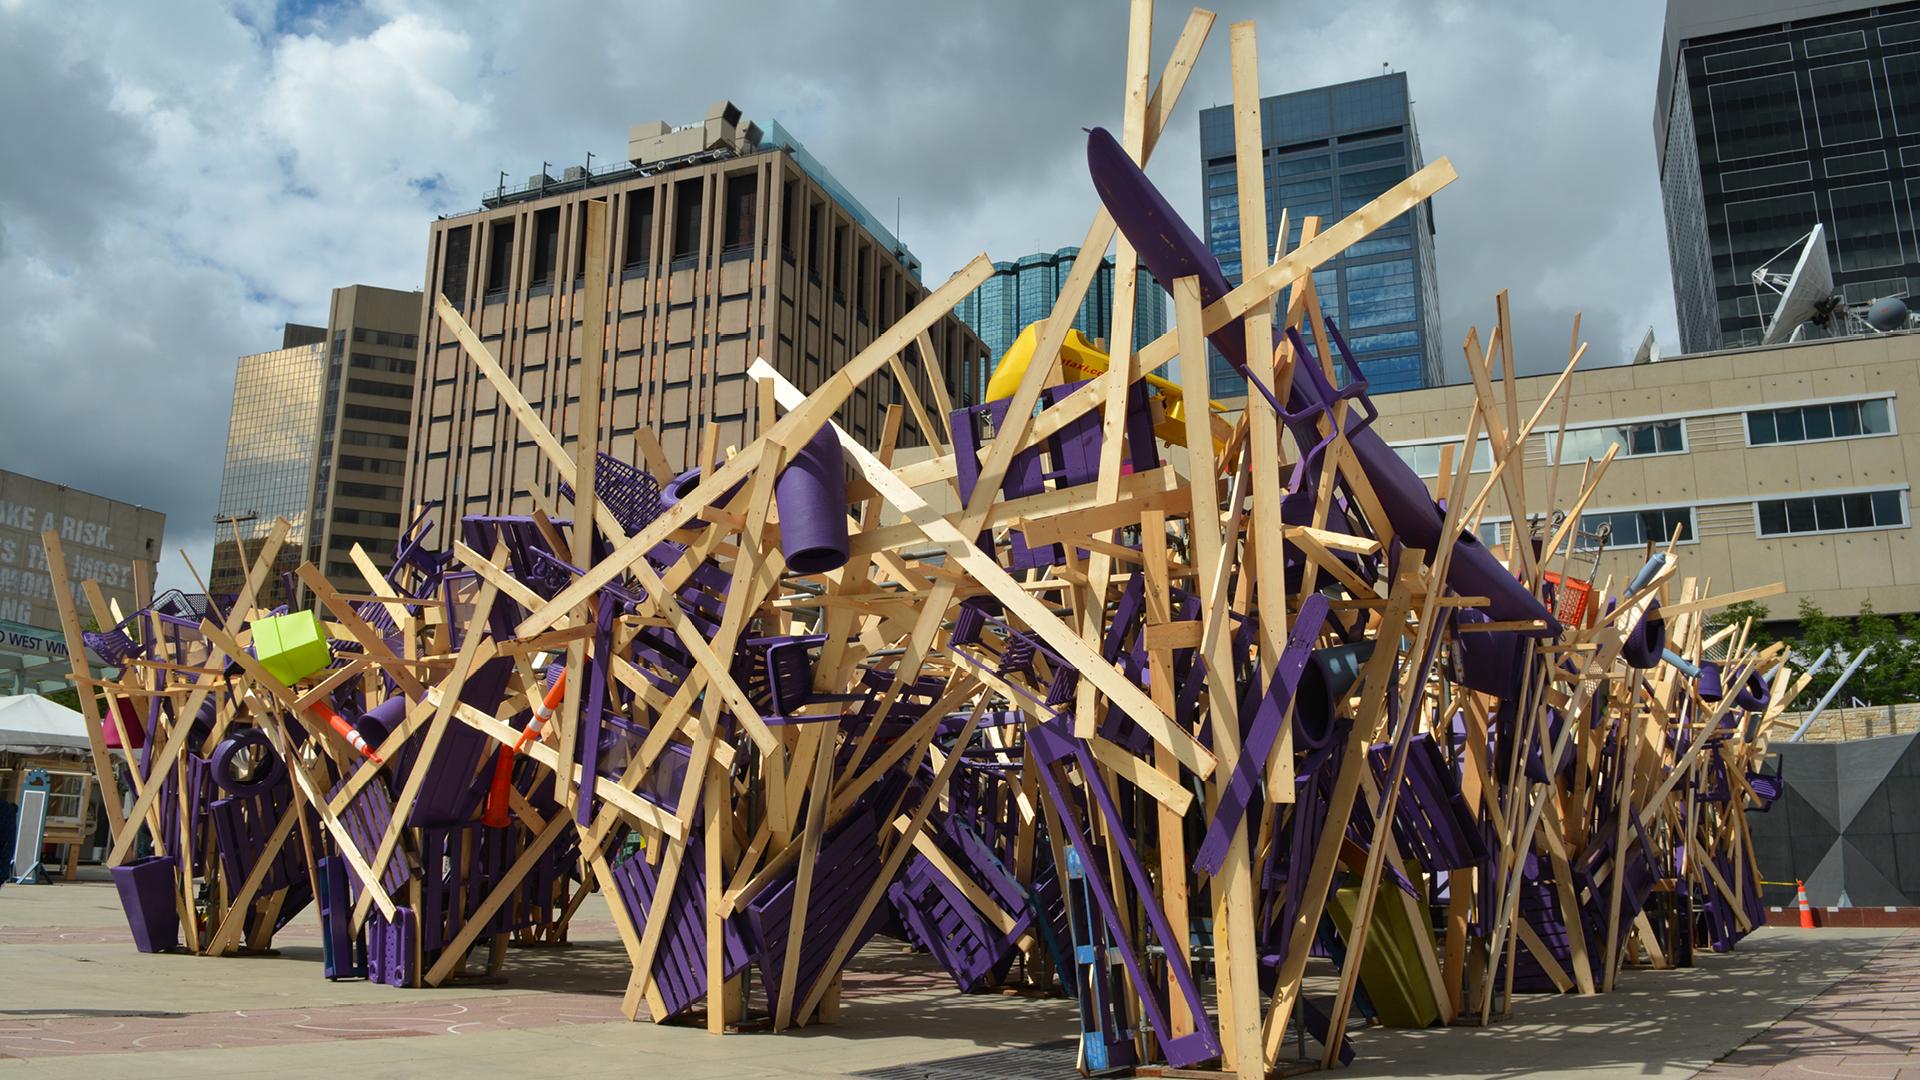 José Luis Torres, Canopy, The Works Art & Design Festival, Sir Winston Churchill Square, Edmonton, Alberta (Canada) 2016| José Luis Torres| STIR